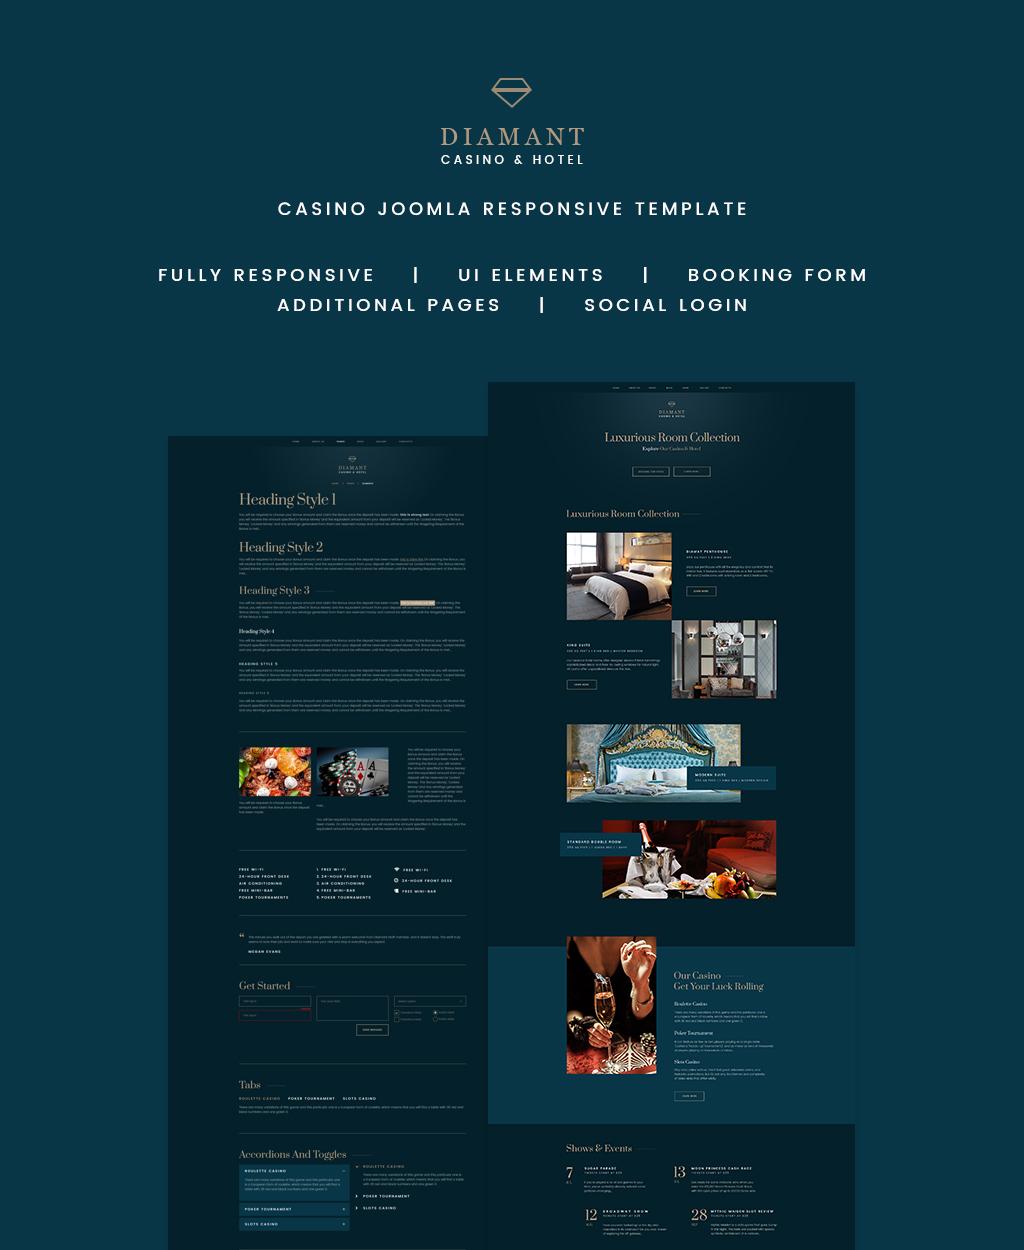 """Diamant - Casino & Hotel"" Responsive Joomla Template №64731 - screenshot"